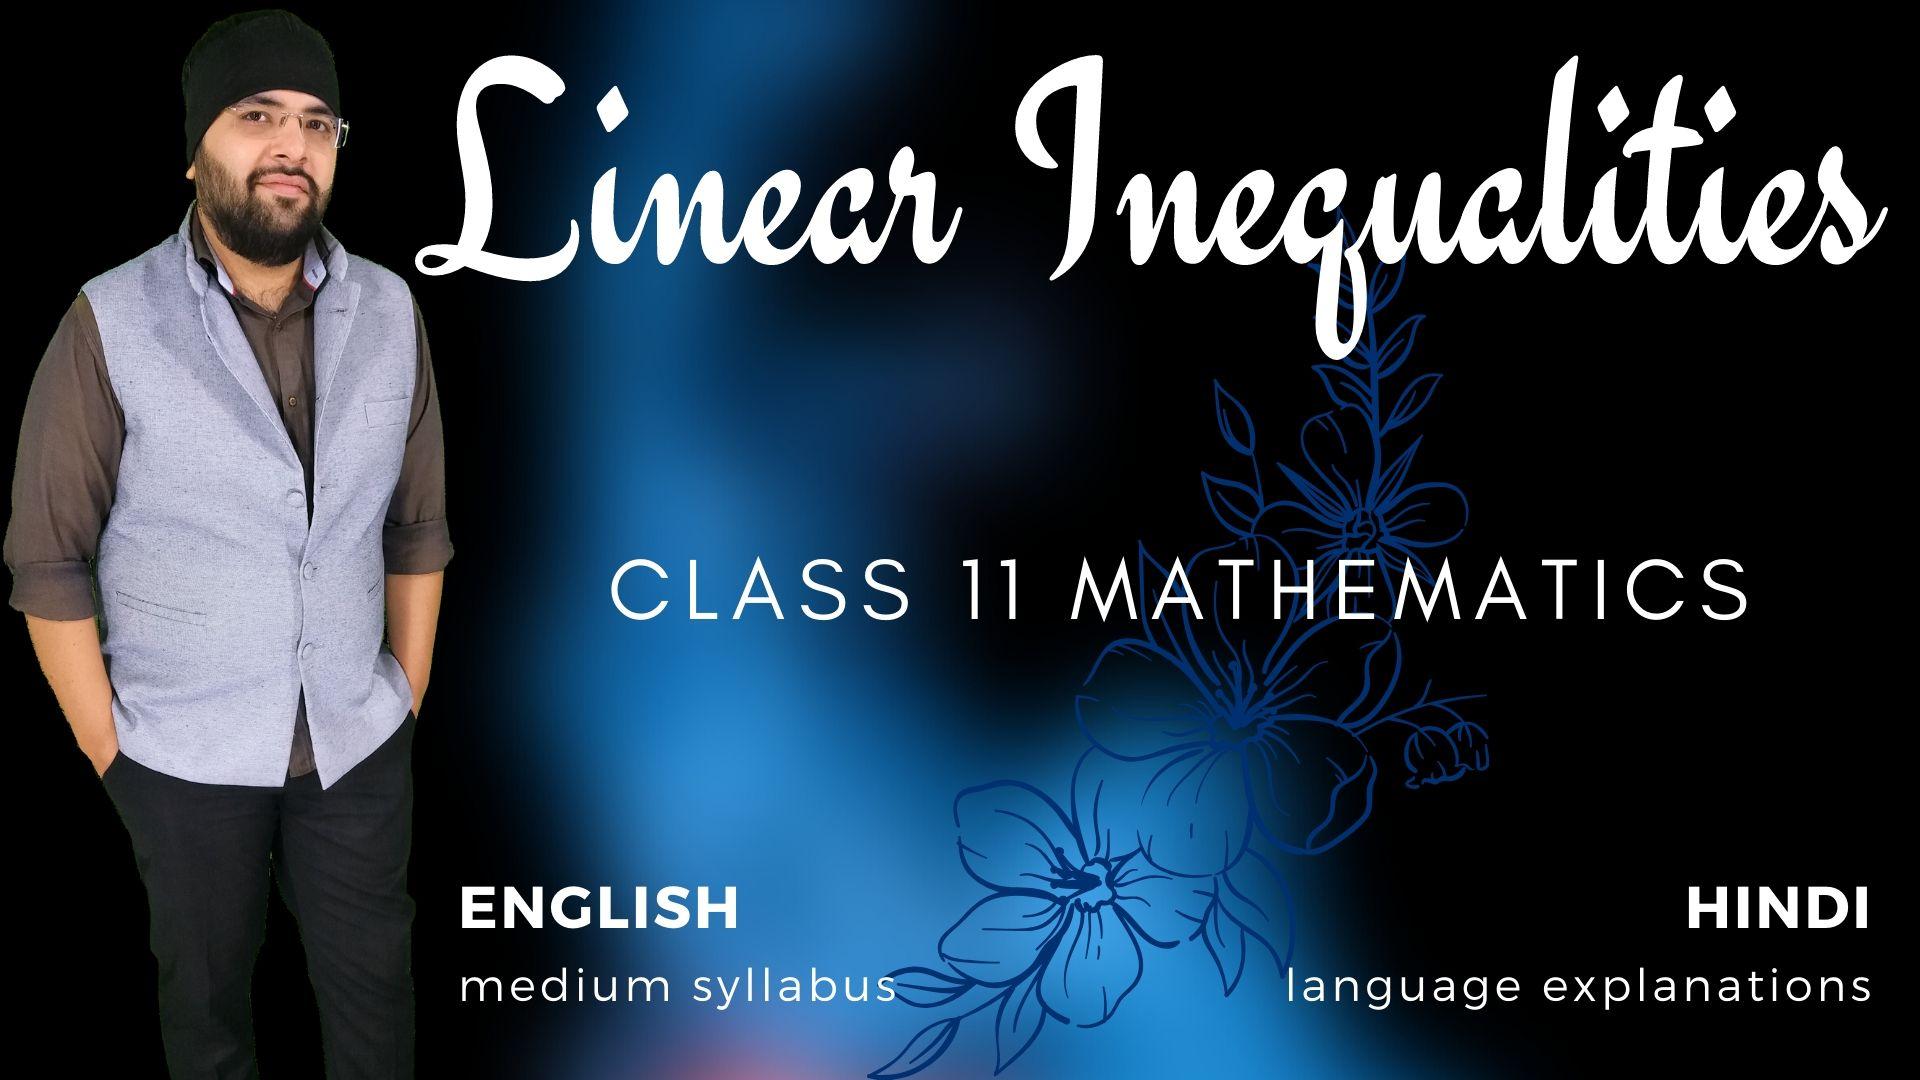 Linear Inequalities Class 11 Maths